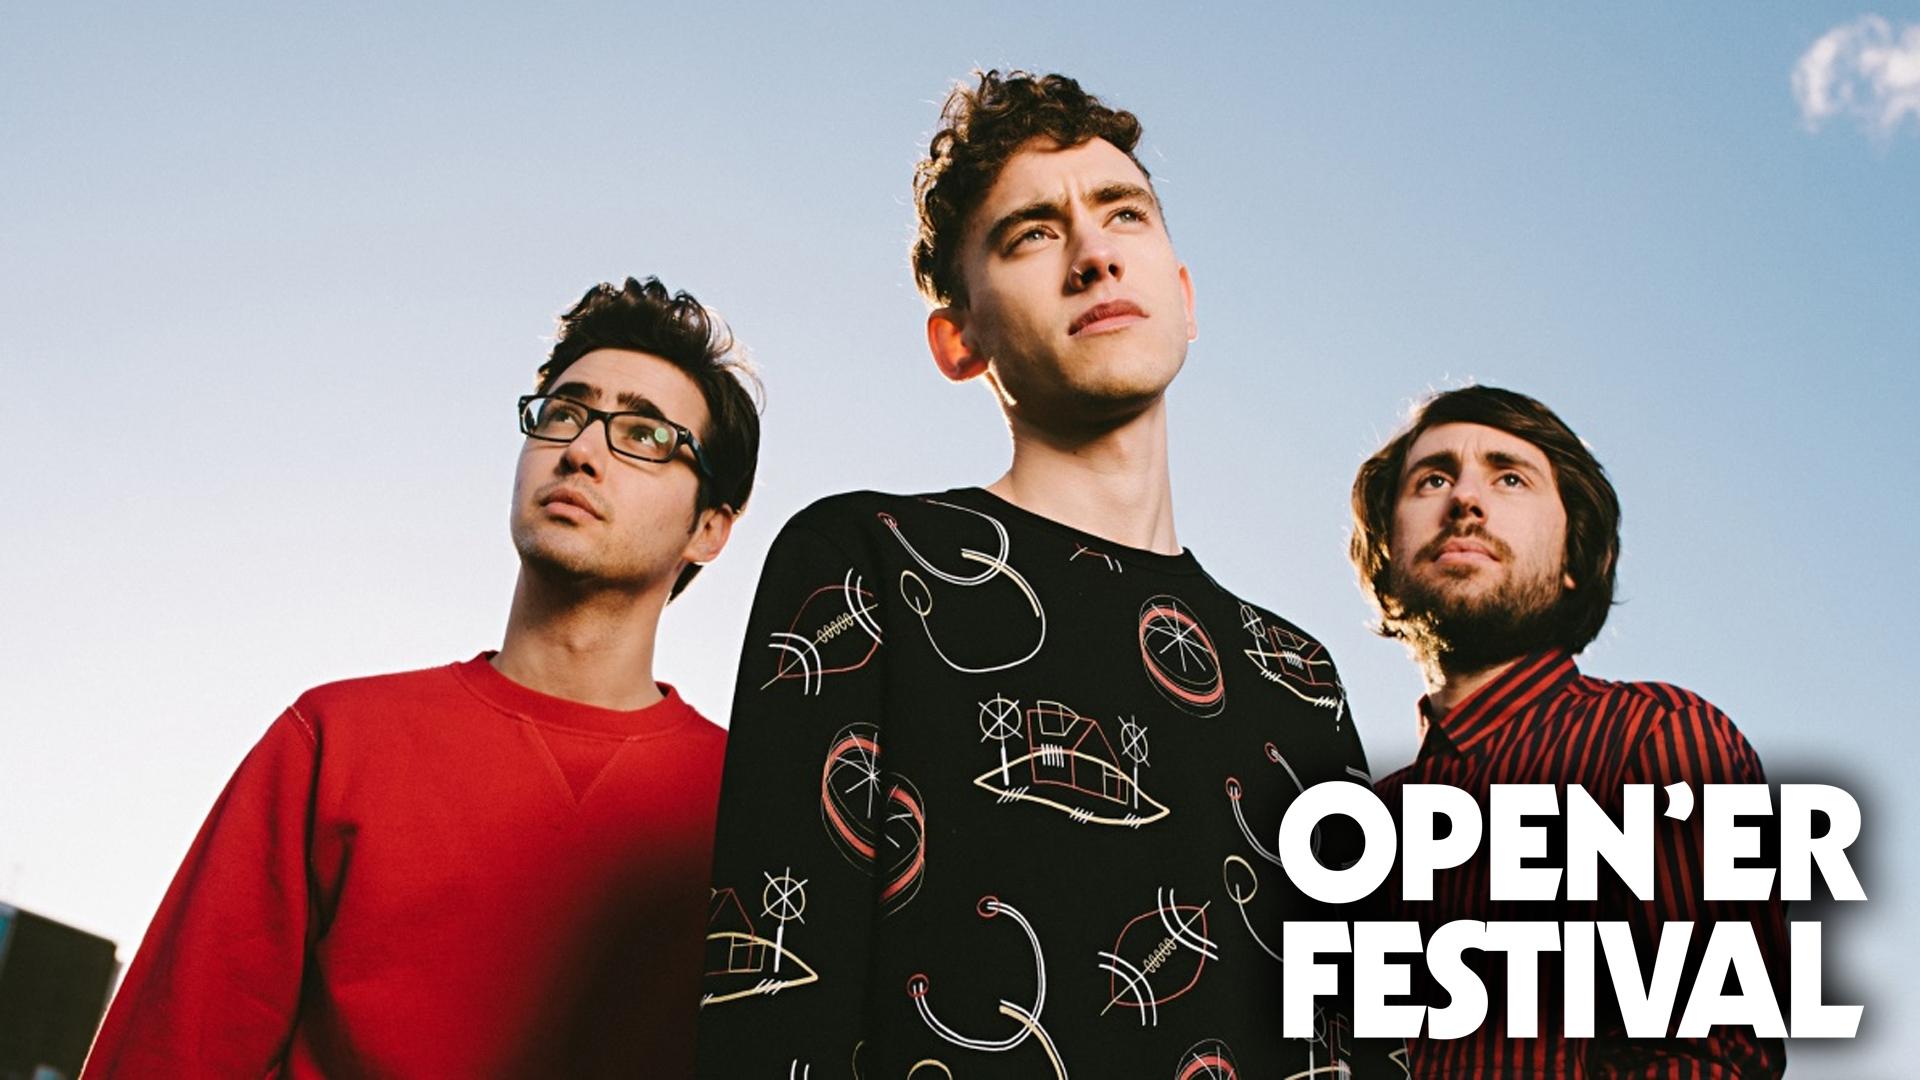 years & years opener festival 2018